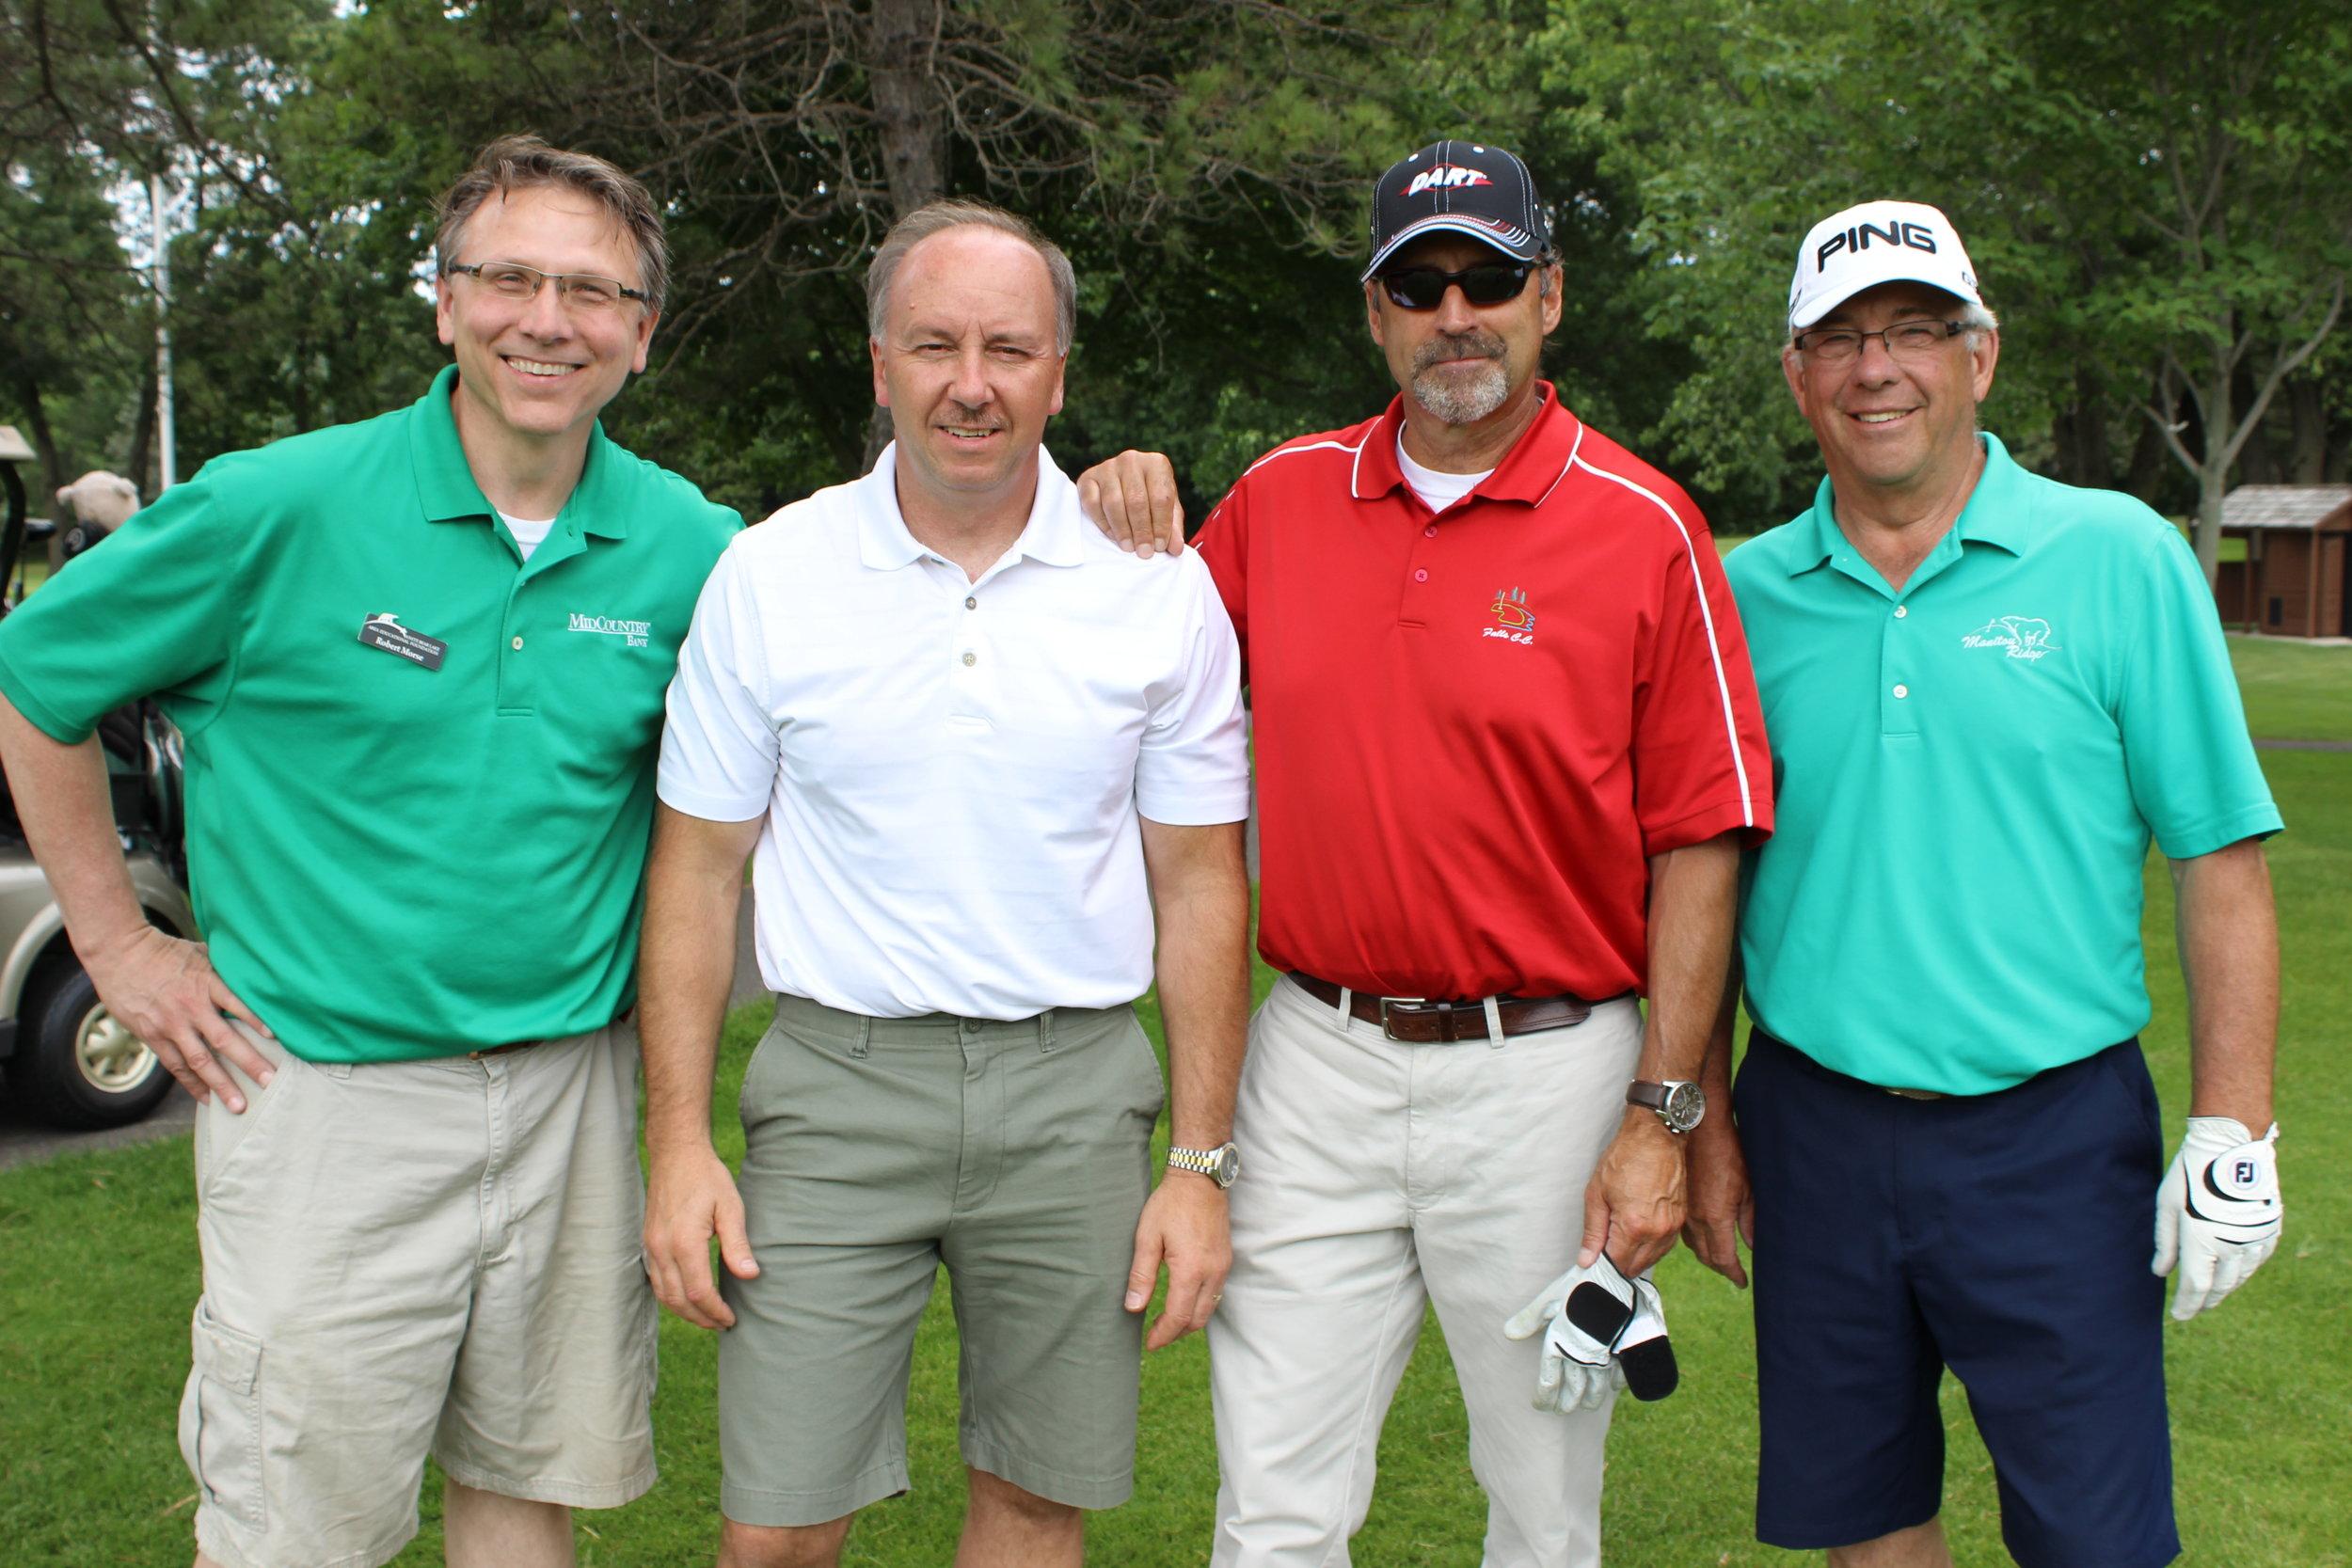 Bob Morse, Jerry Kwapick, Kevin Hartzell, Pat McFarlane.jpg